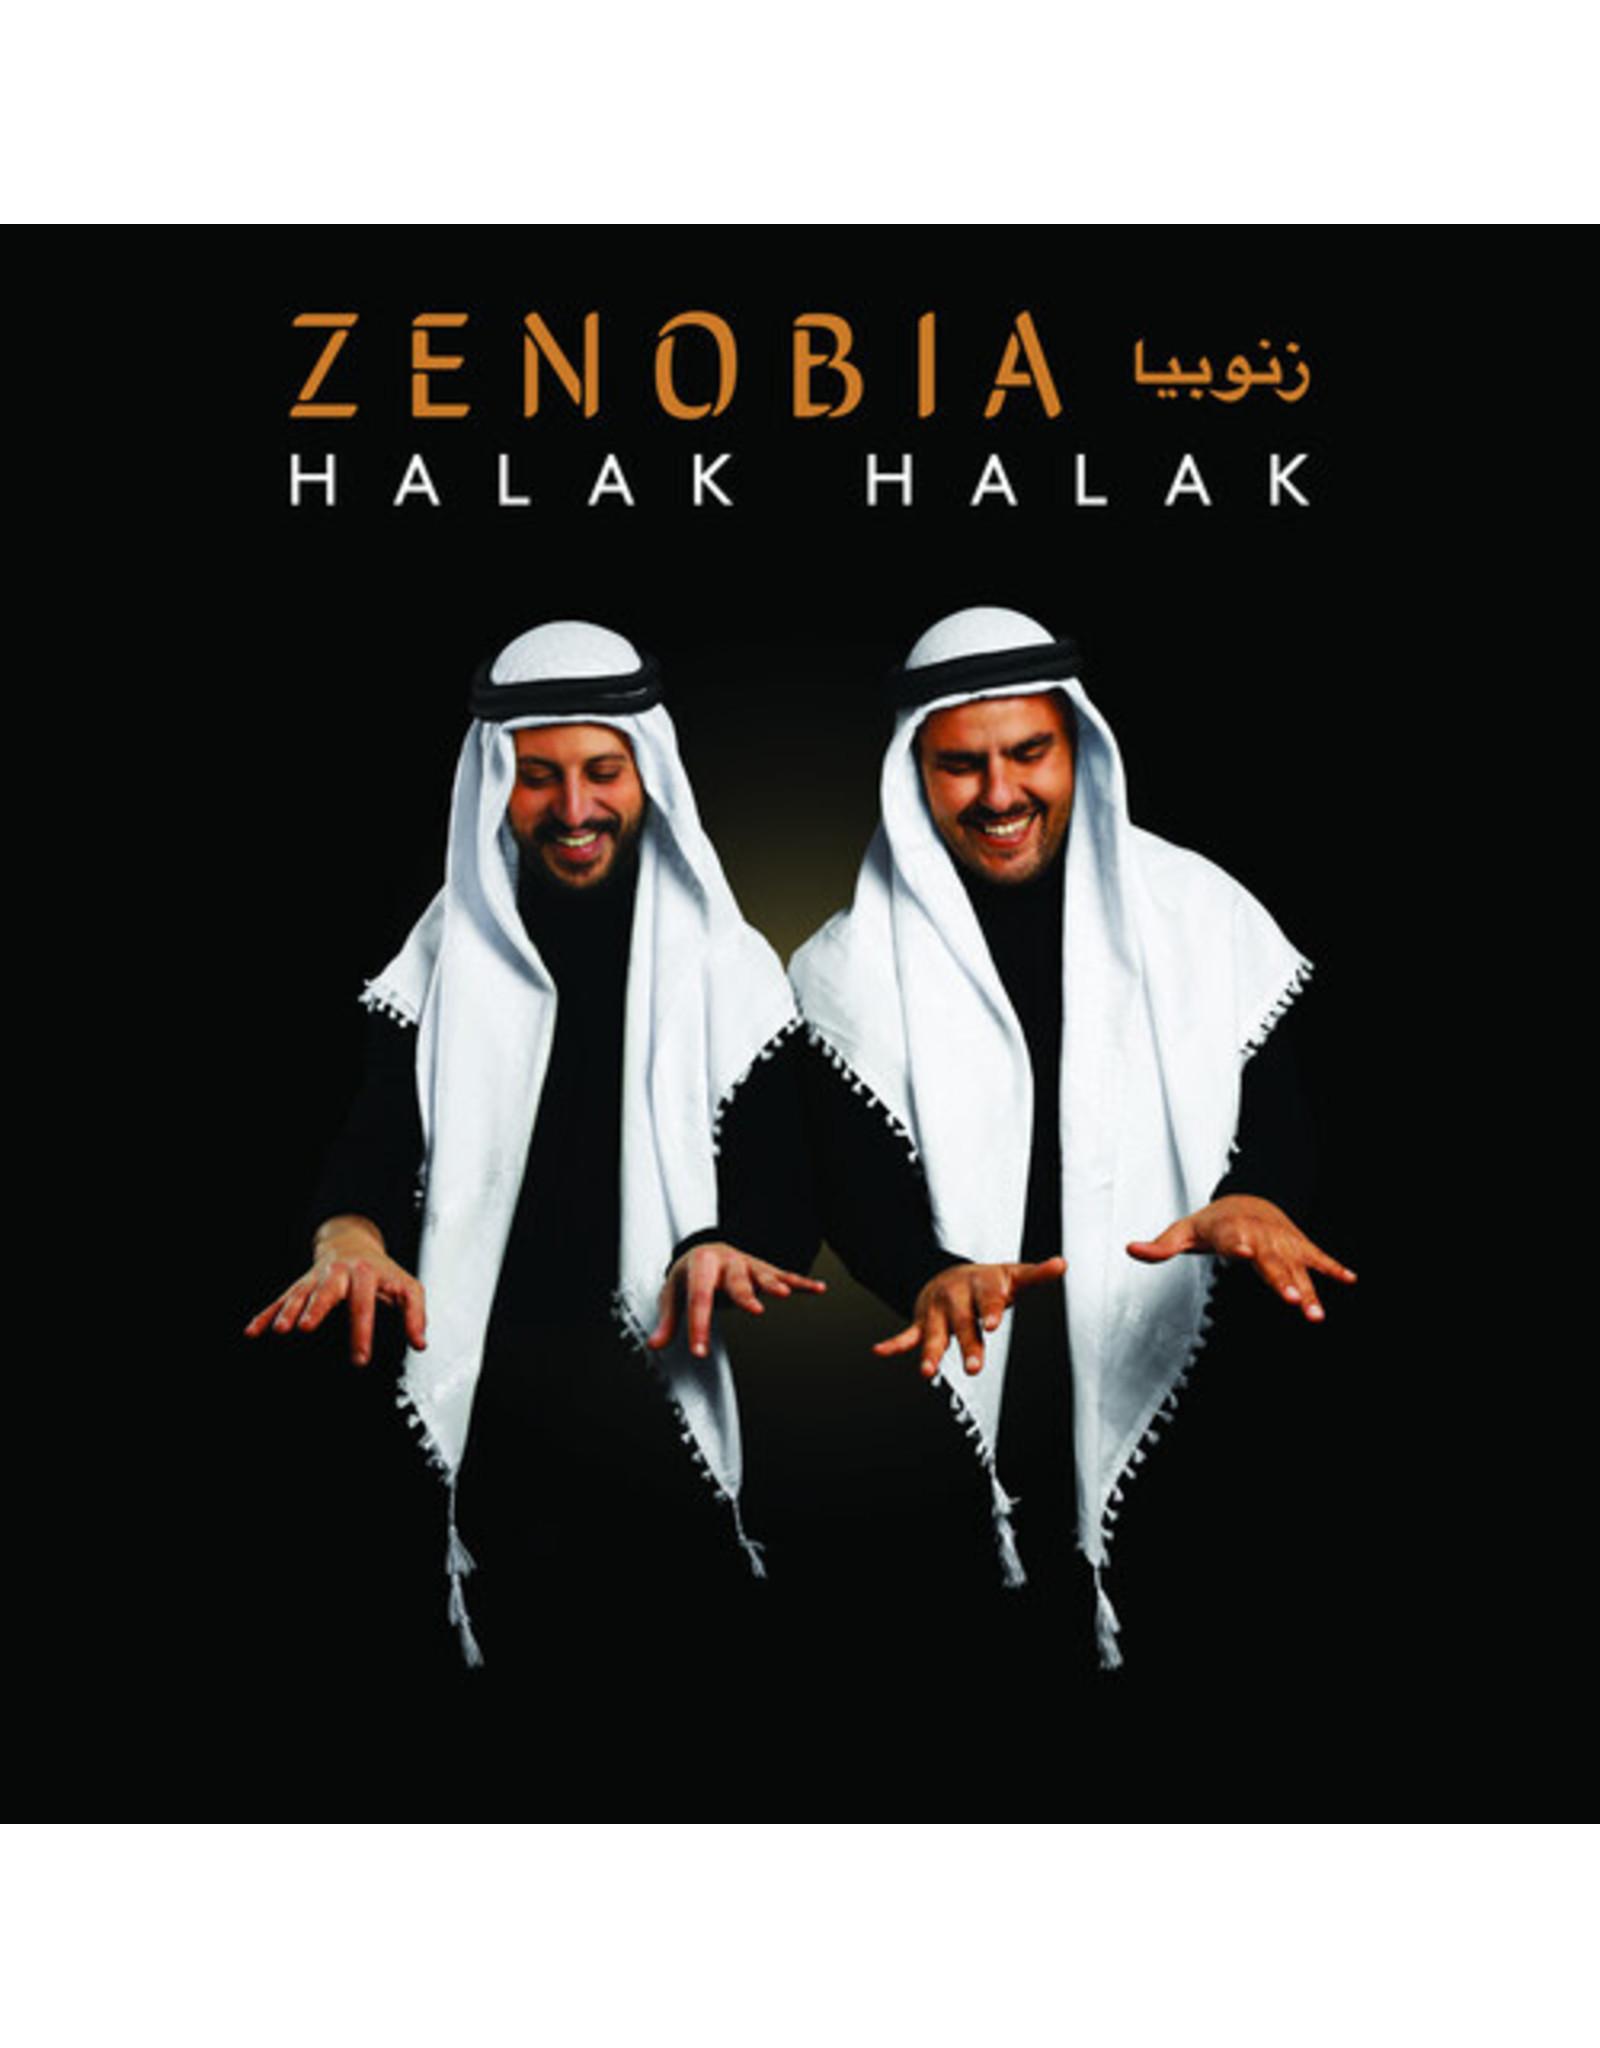 New Vinyl Zenobia - Halak, Halak LP